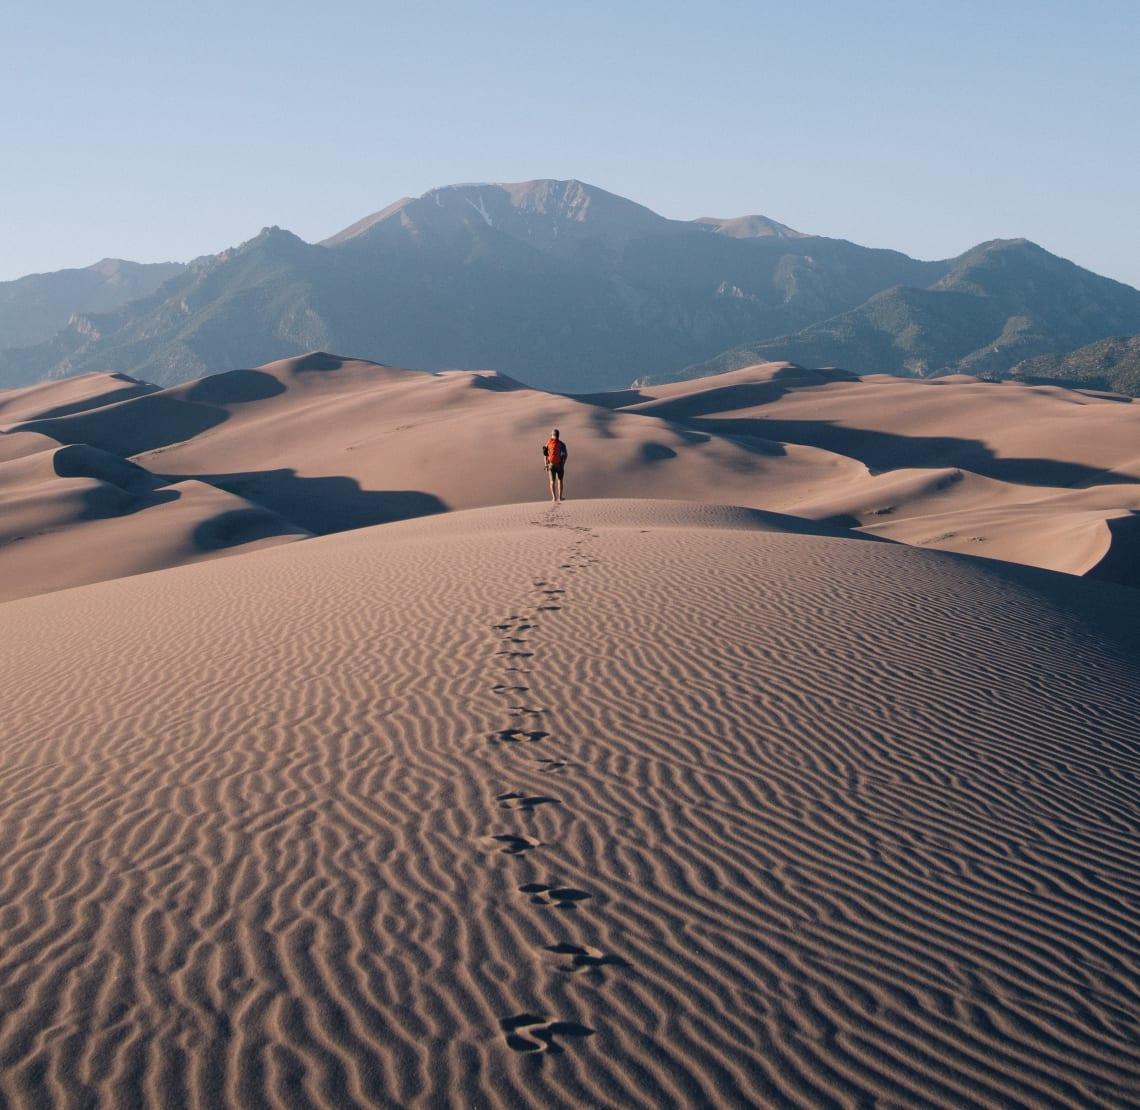 Solo traveler exploring a desert landscape